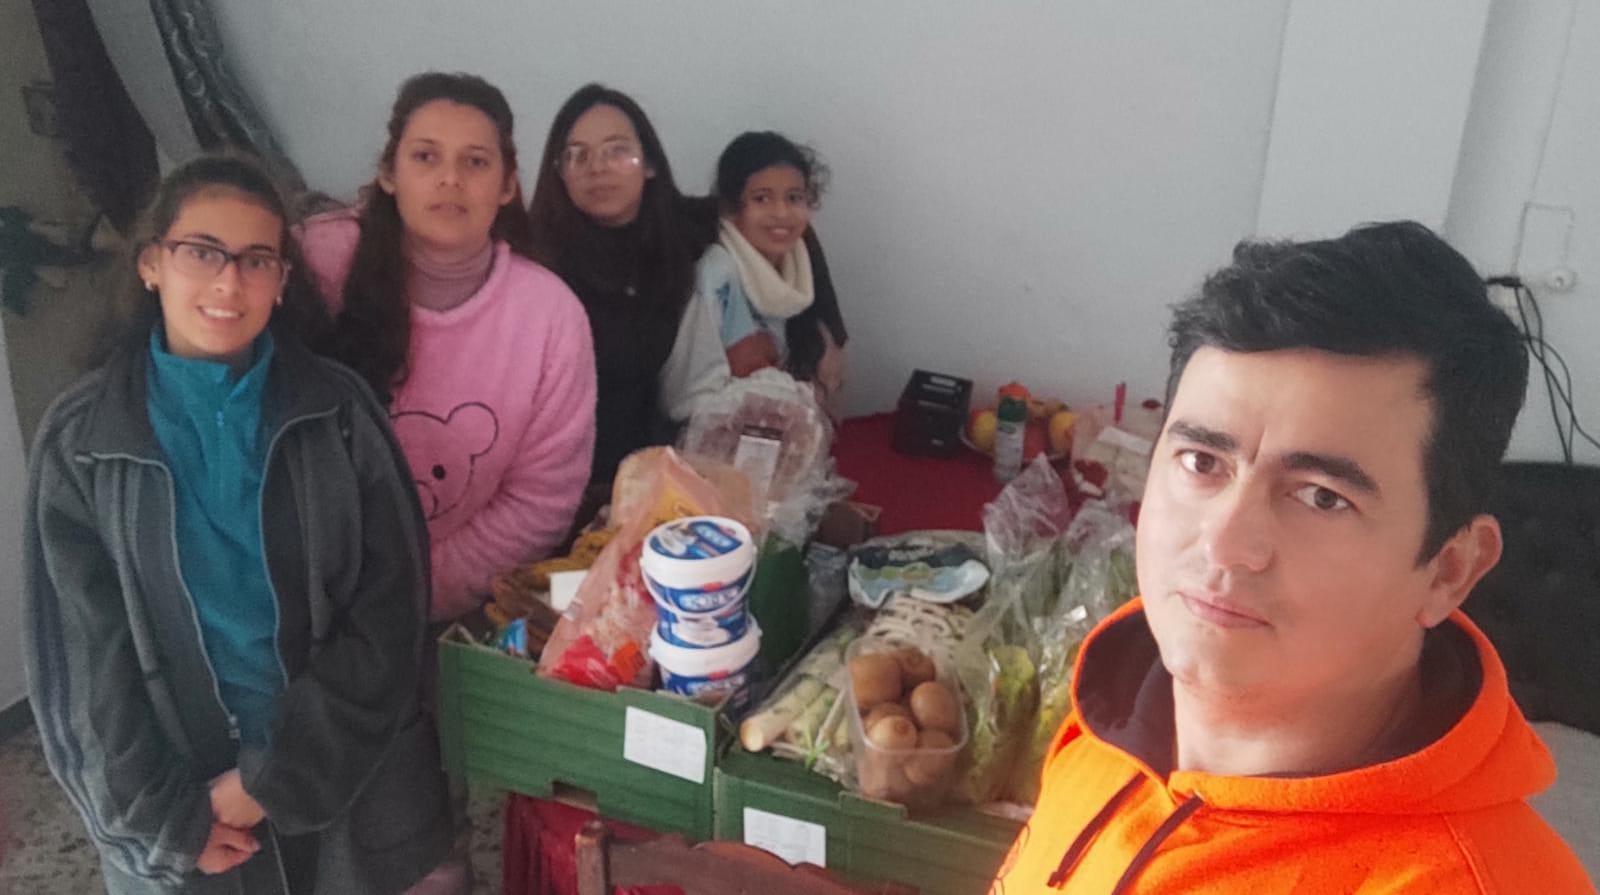 New Feeding program partnership in Málaga, Spain